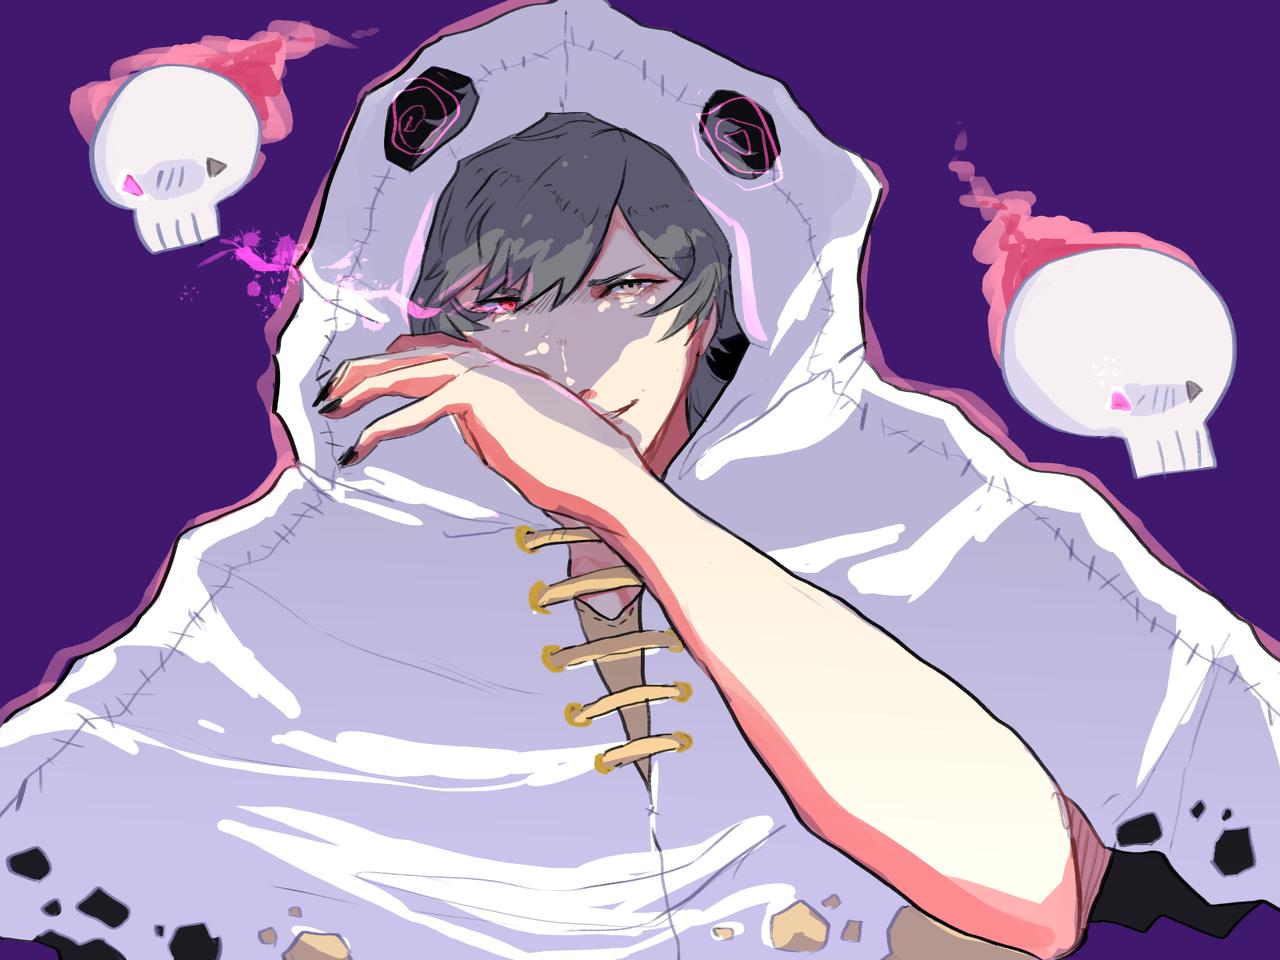 Ghost!Ran